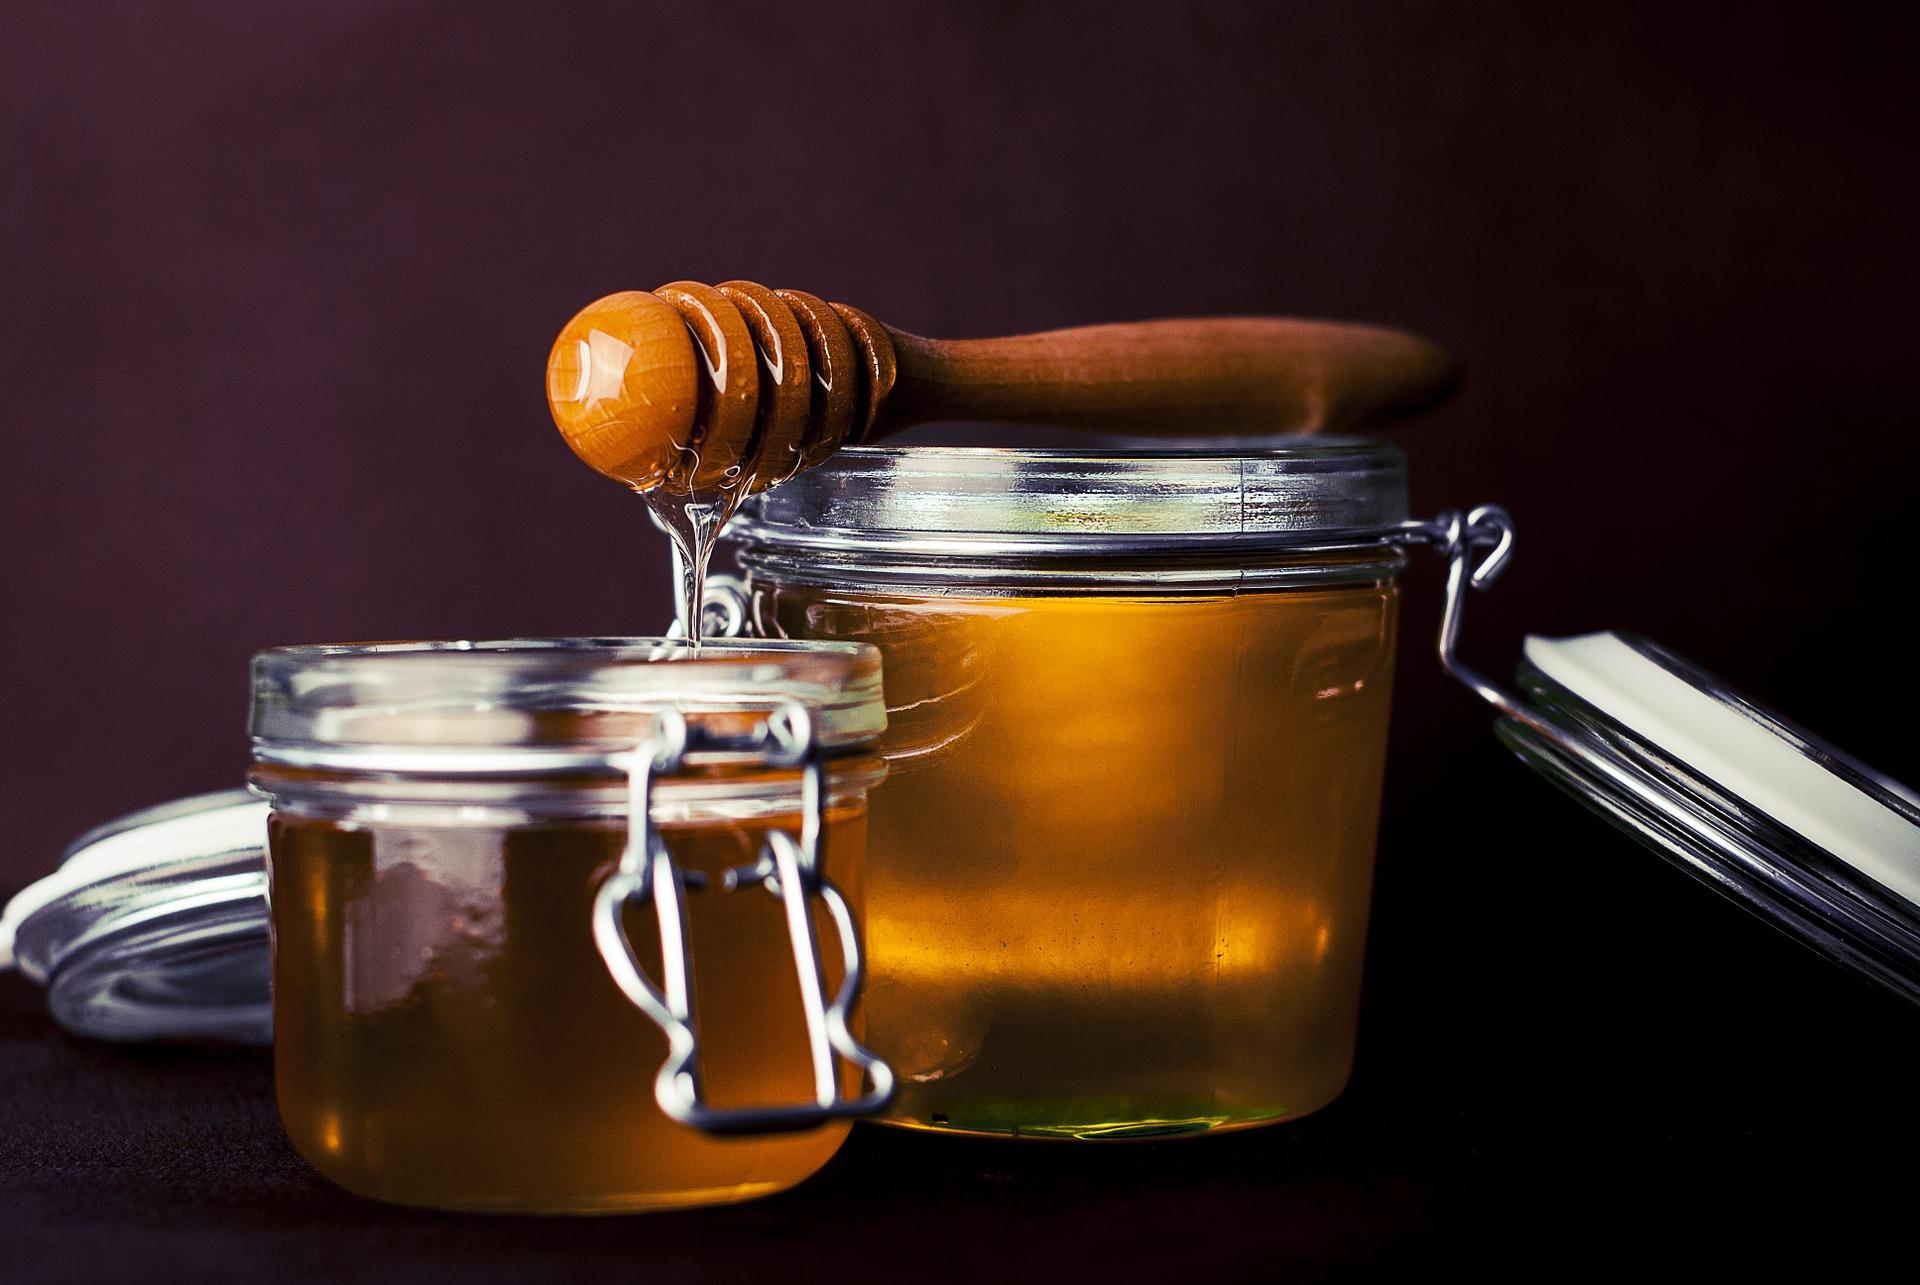 Pohankový med